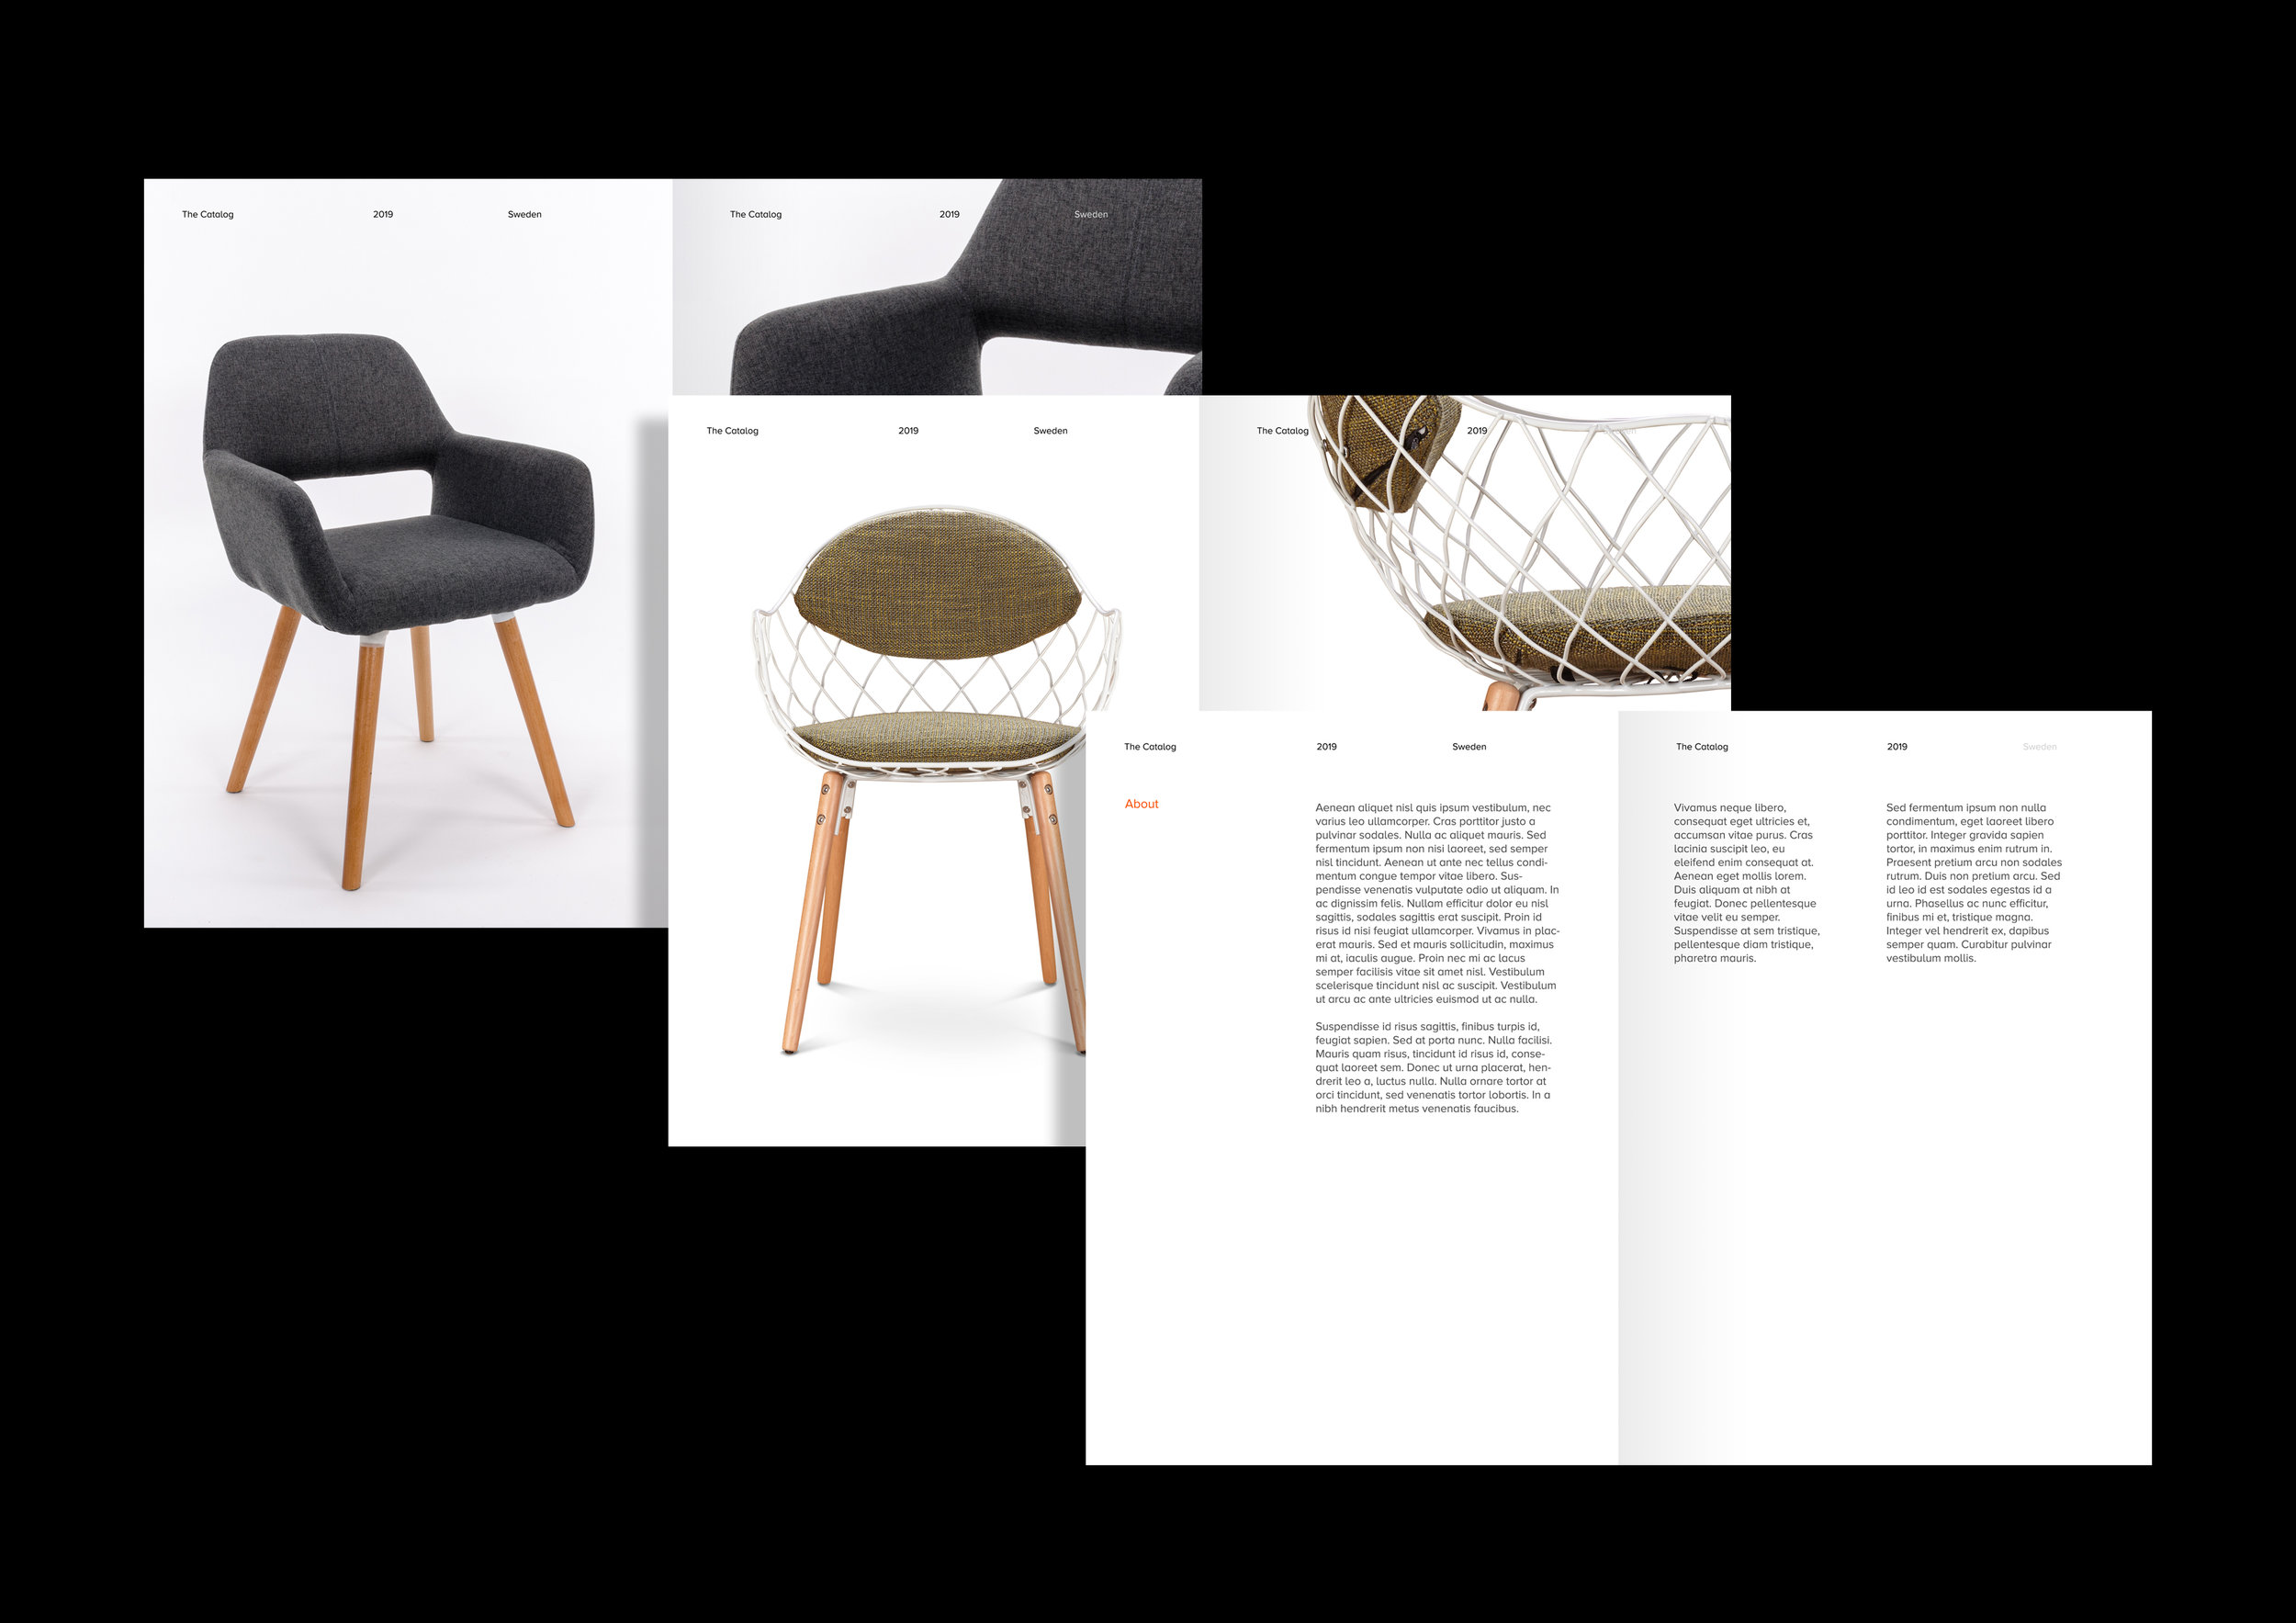 catalog5.jpg